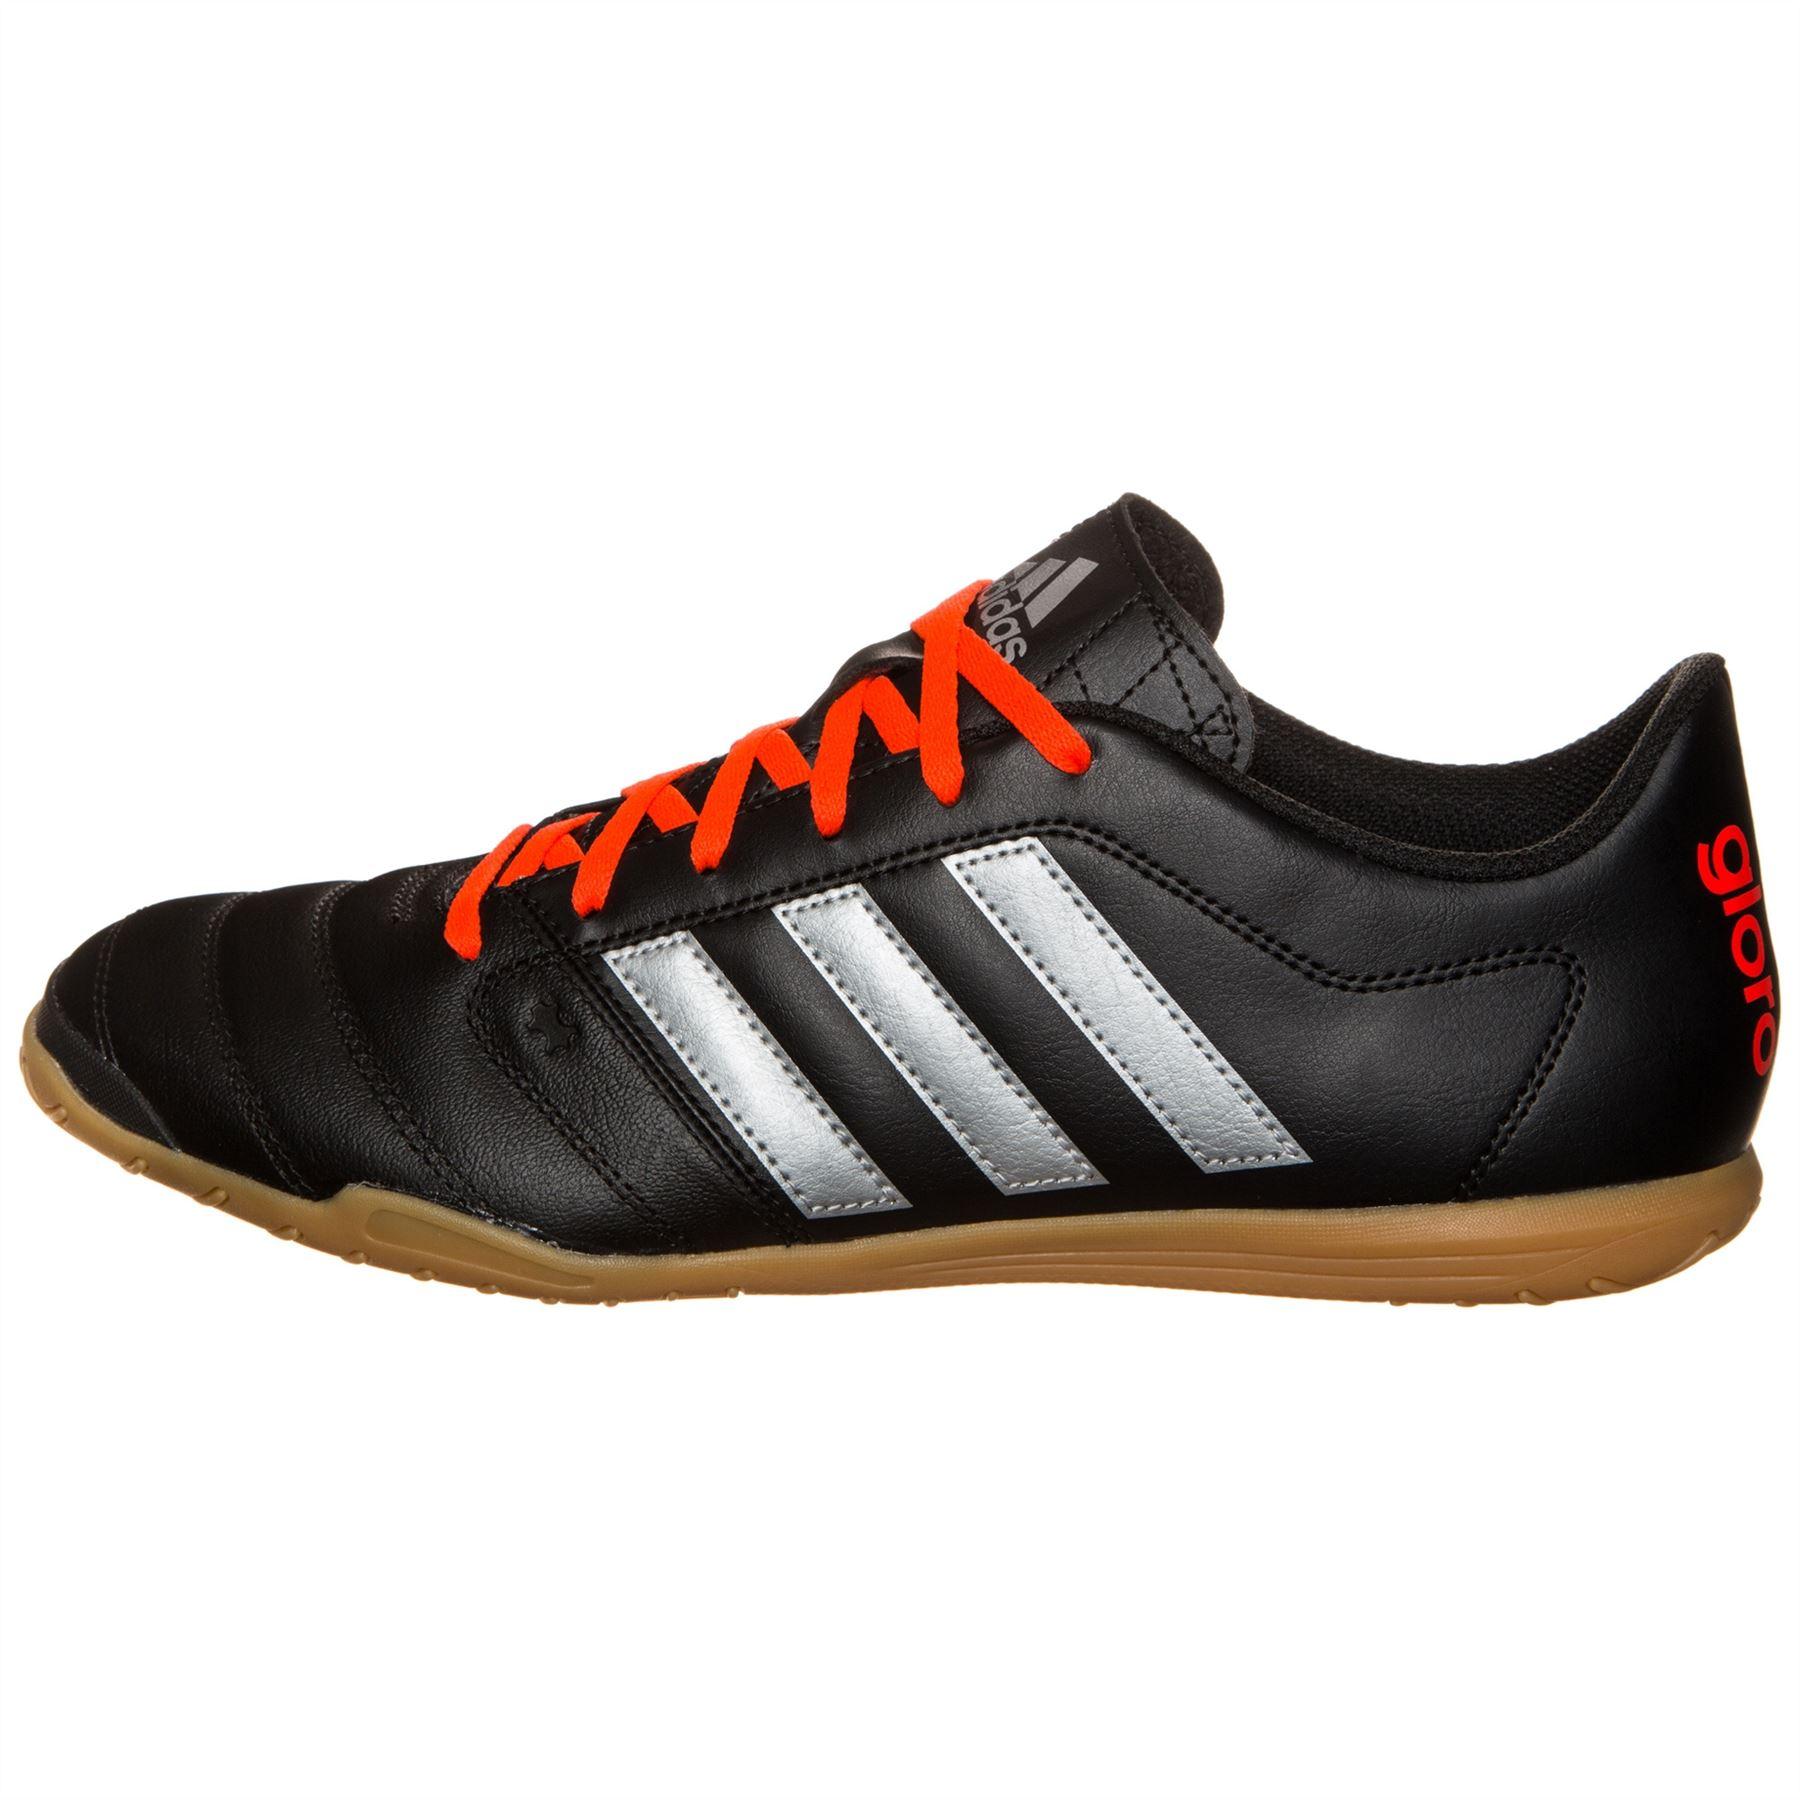 ... adidas Gloro 16.2 Indoor Football Trainers Mens Black Soccer Futsal  Sneakers ...